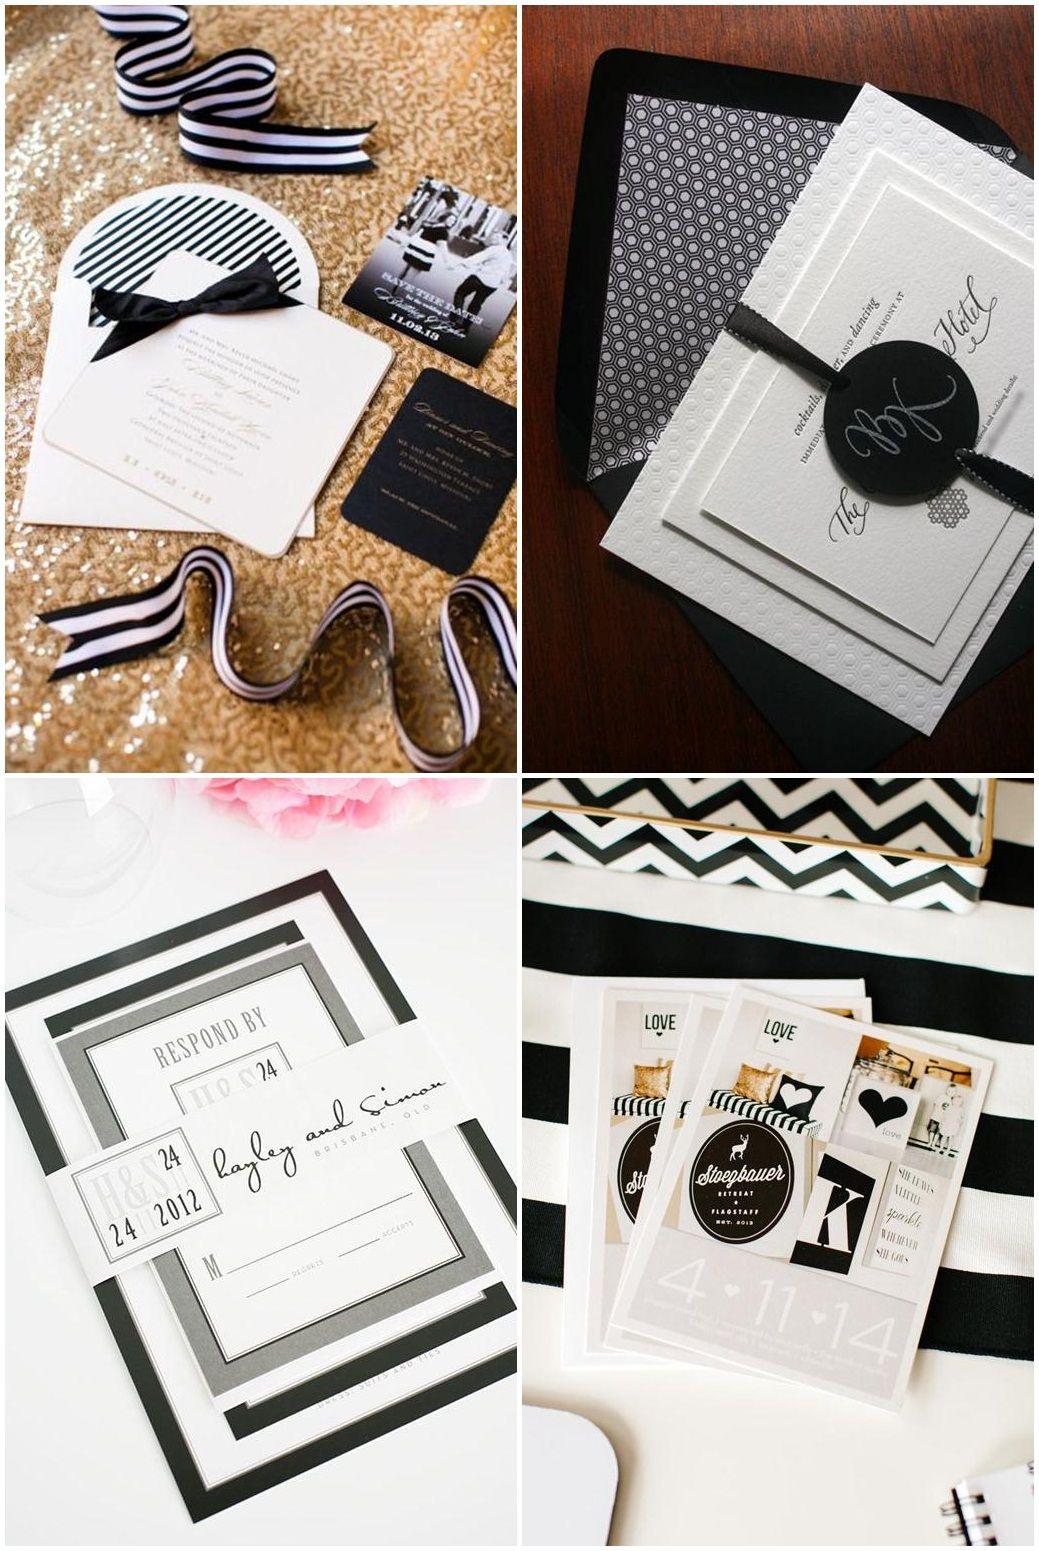 Black And White Theme Party Invitations Ideas White Party Theme